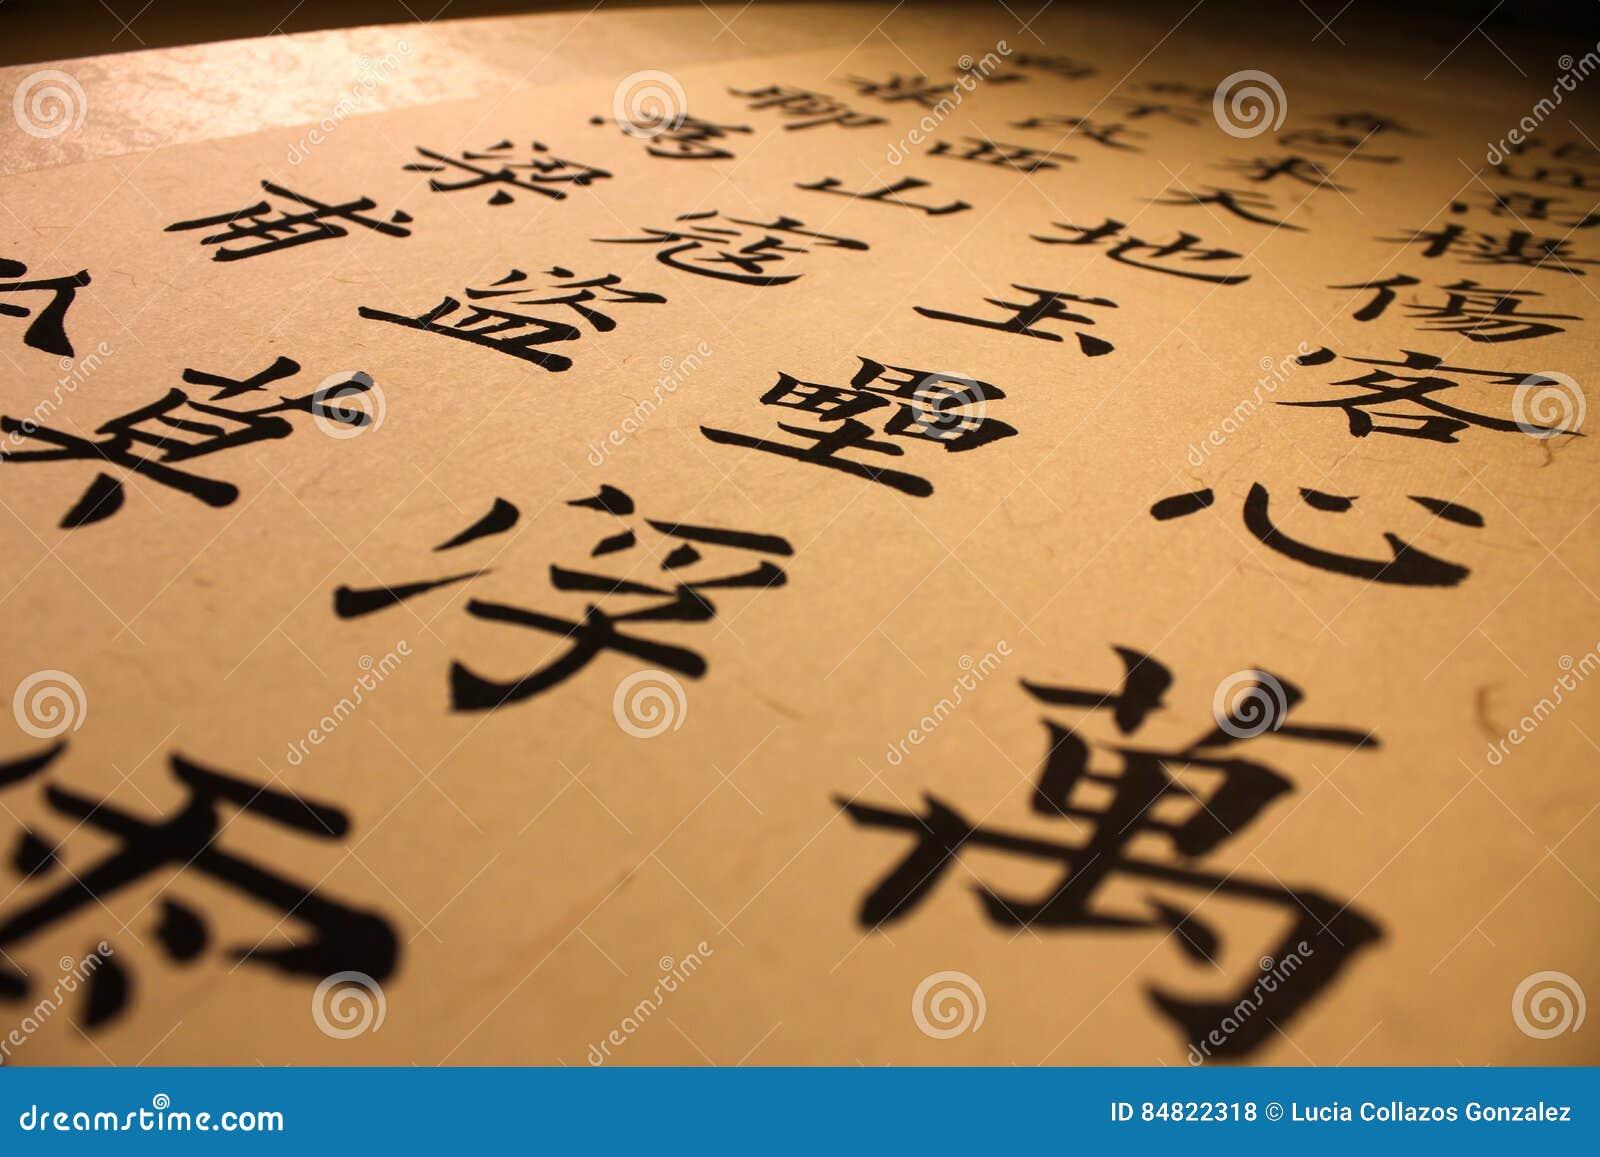 Chinese Calligraphy Stock Illustration Image 84822318